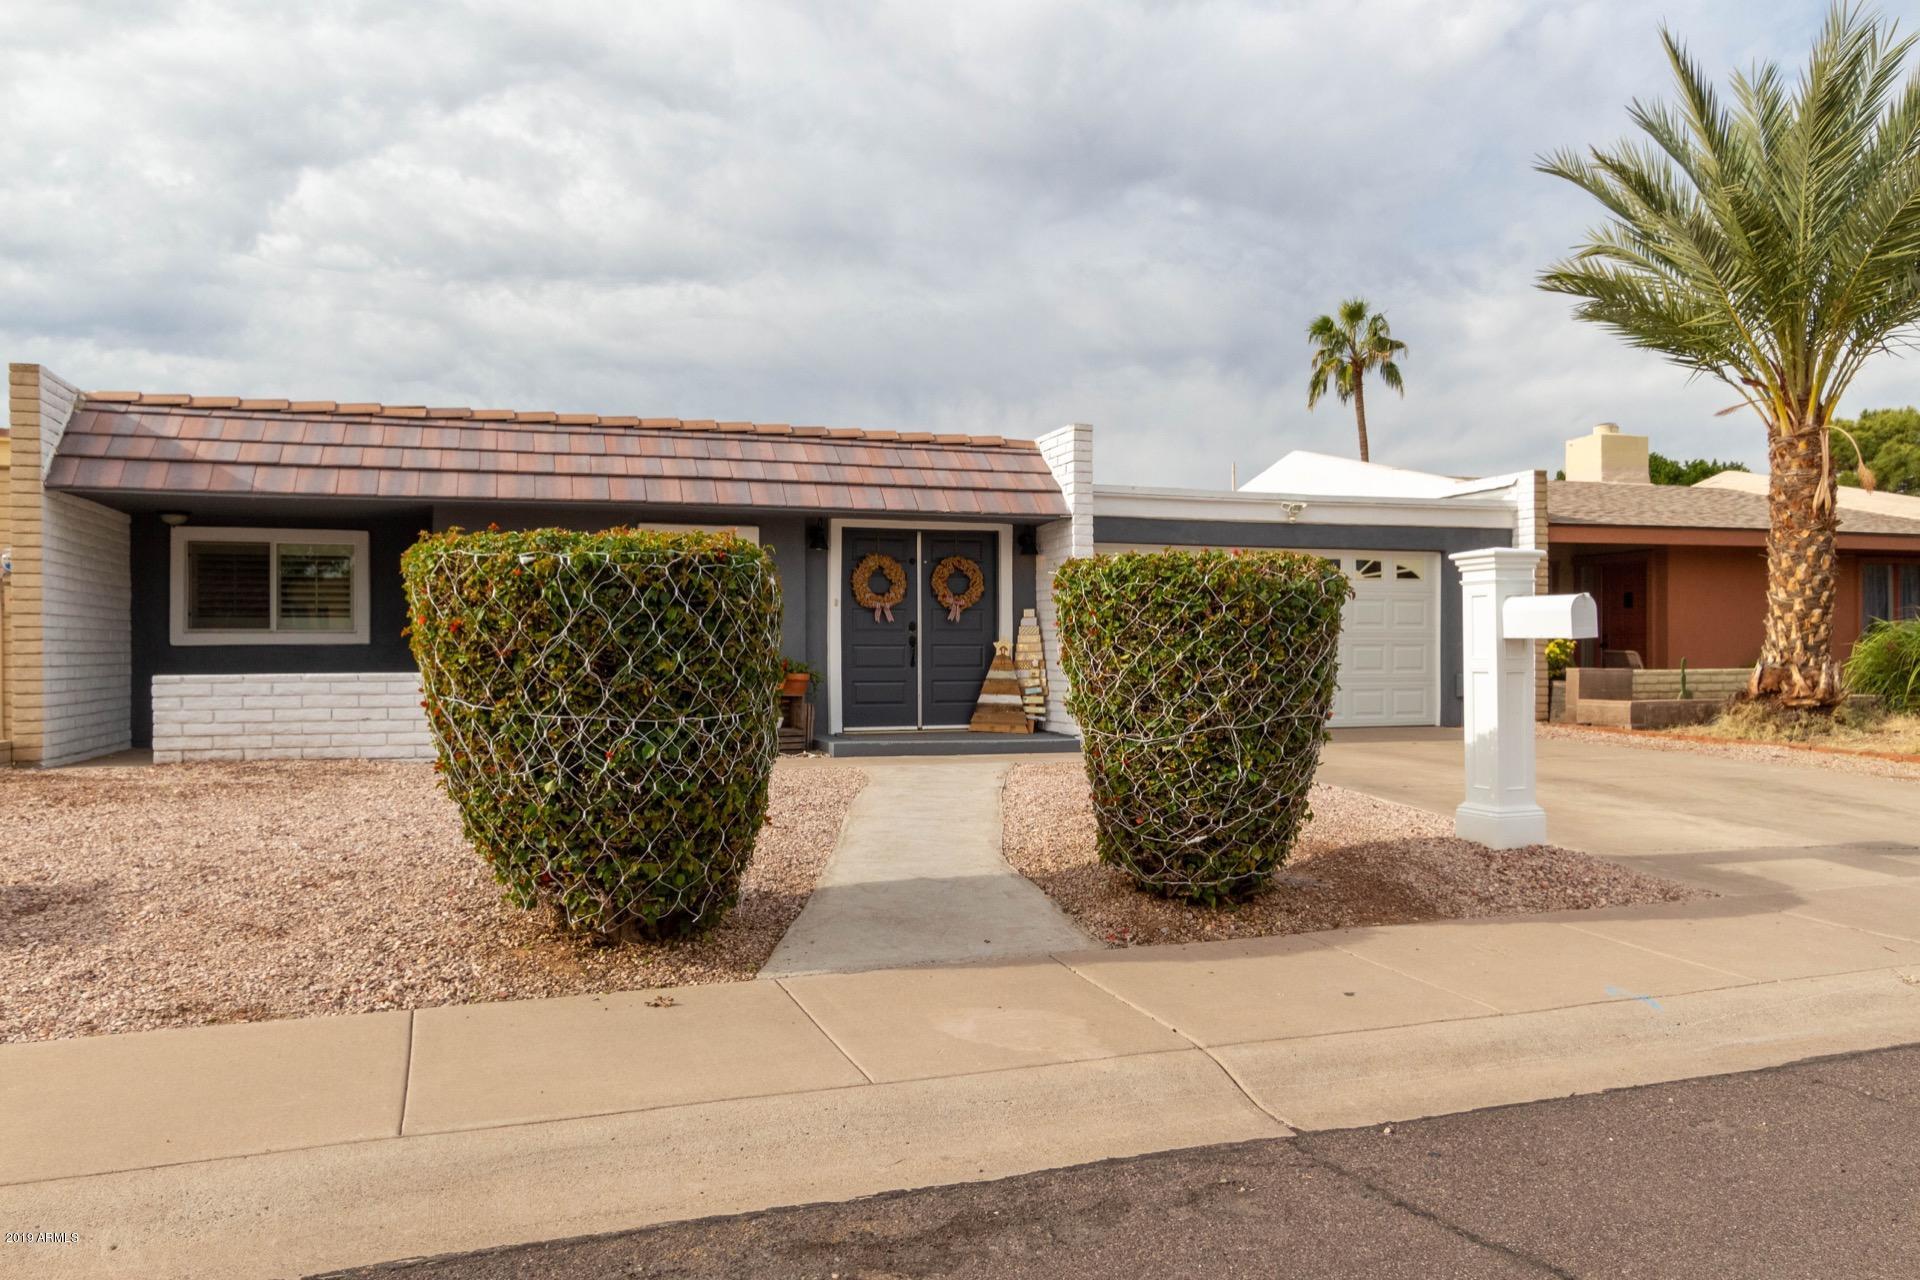 Photo of 414 S CABRITO Circle, Litchfield Park, AZ 85340